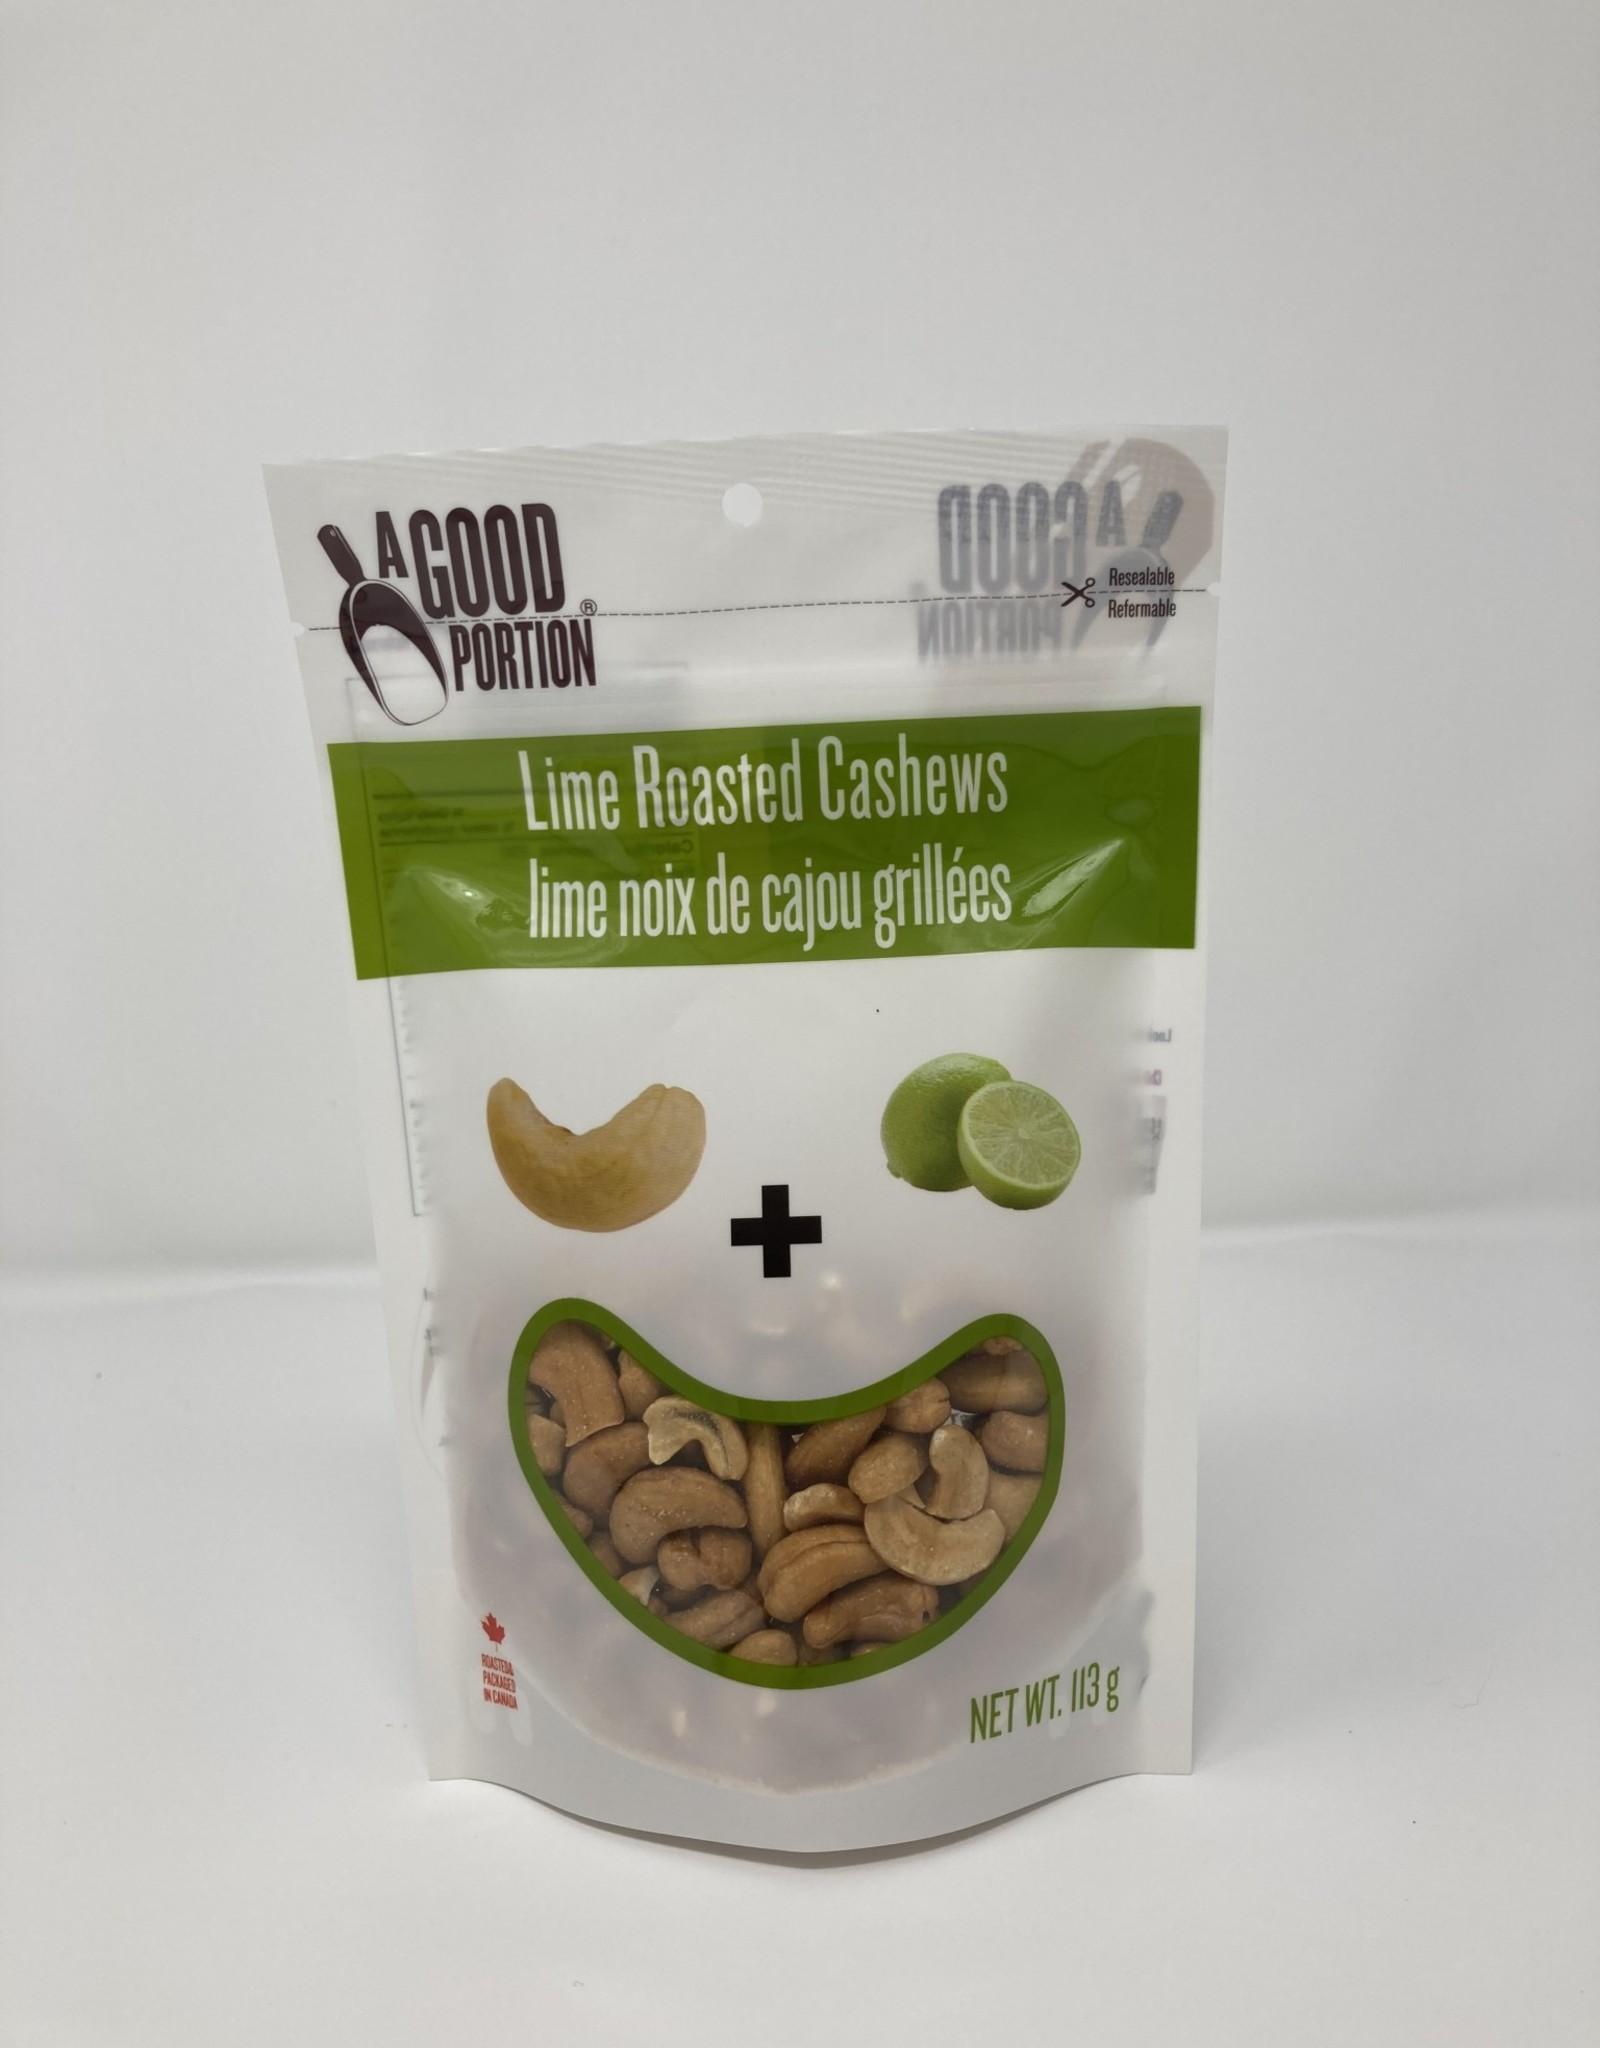 A Good Portion A Good Portion - Cashews, Roasted Lime